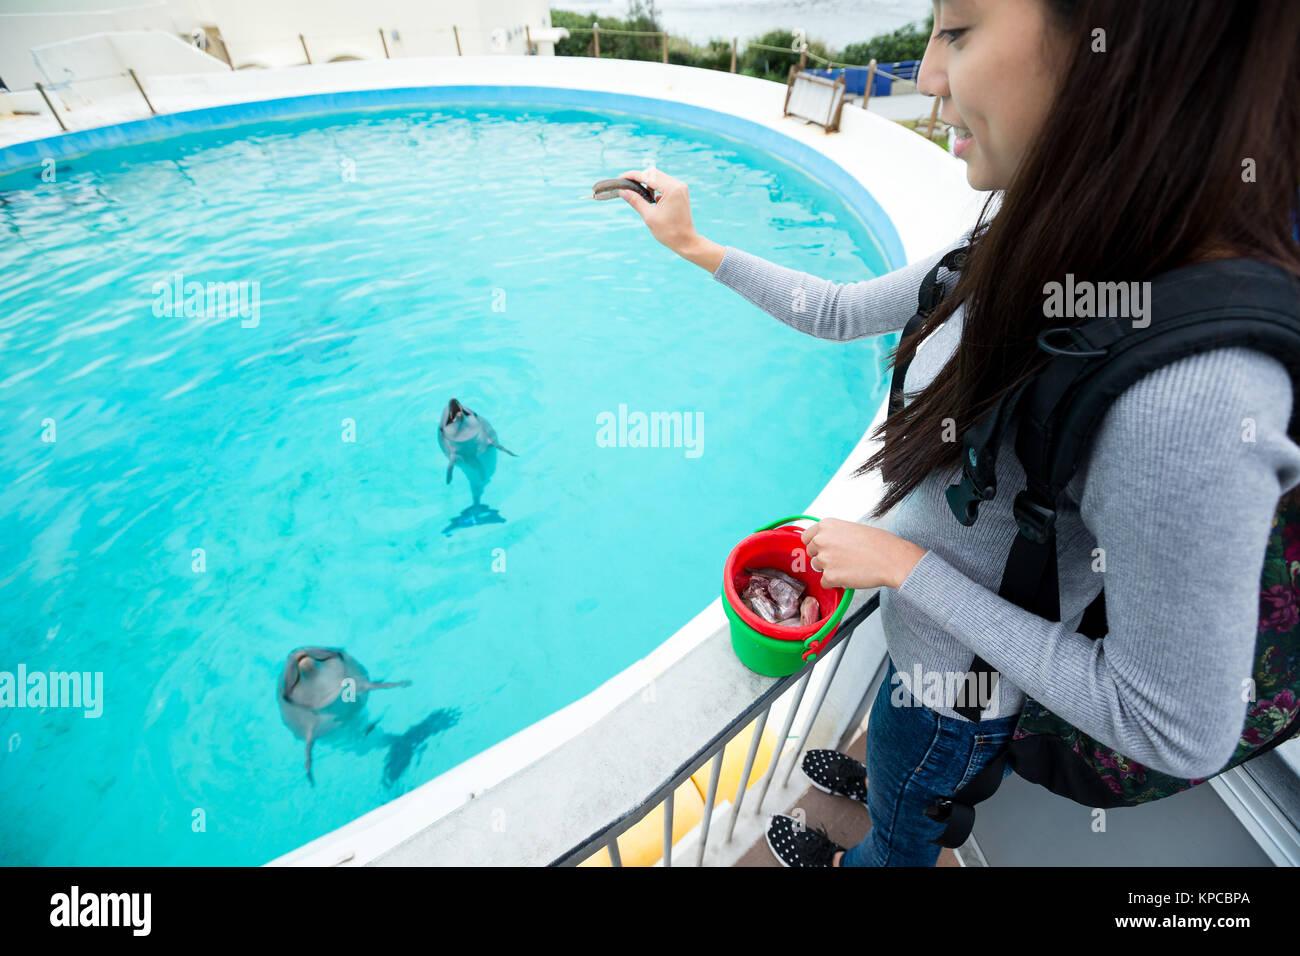 Woman feeding dolphin in aquarium - Stock Image